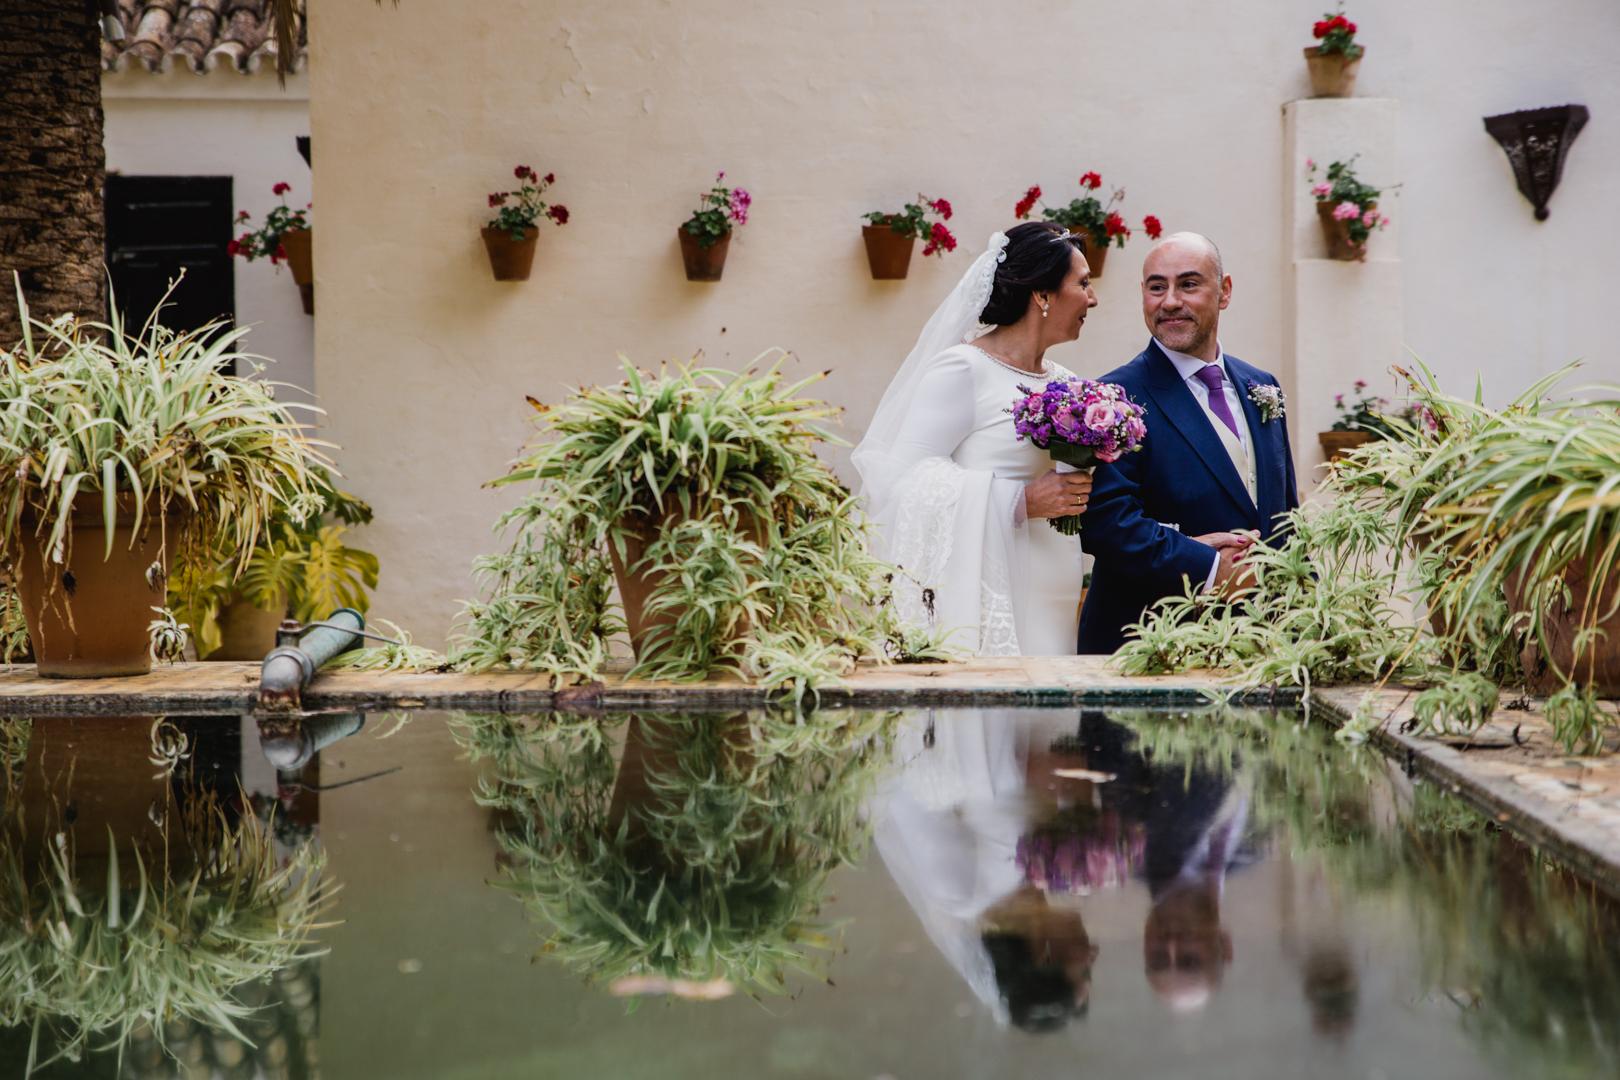 2-boda hacienda torre doña maria. carlos pavon fotografia. 600257783-45.jpg